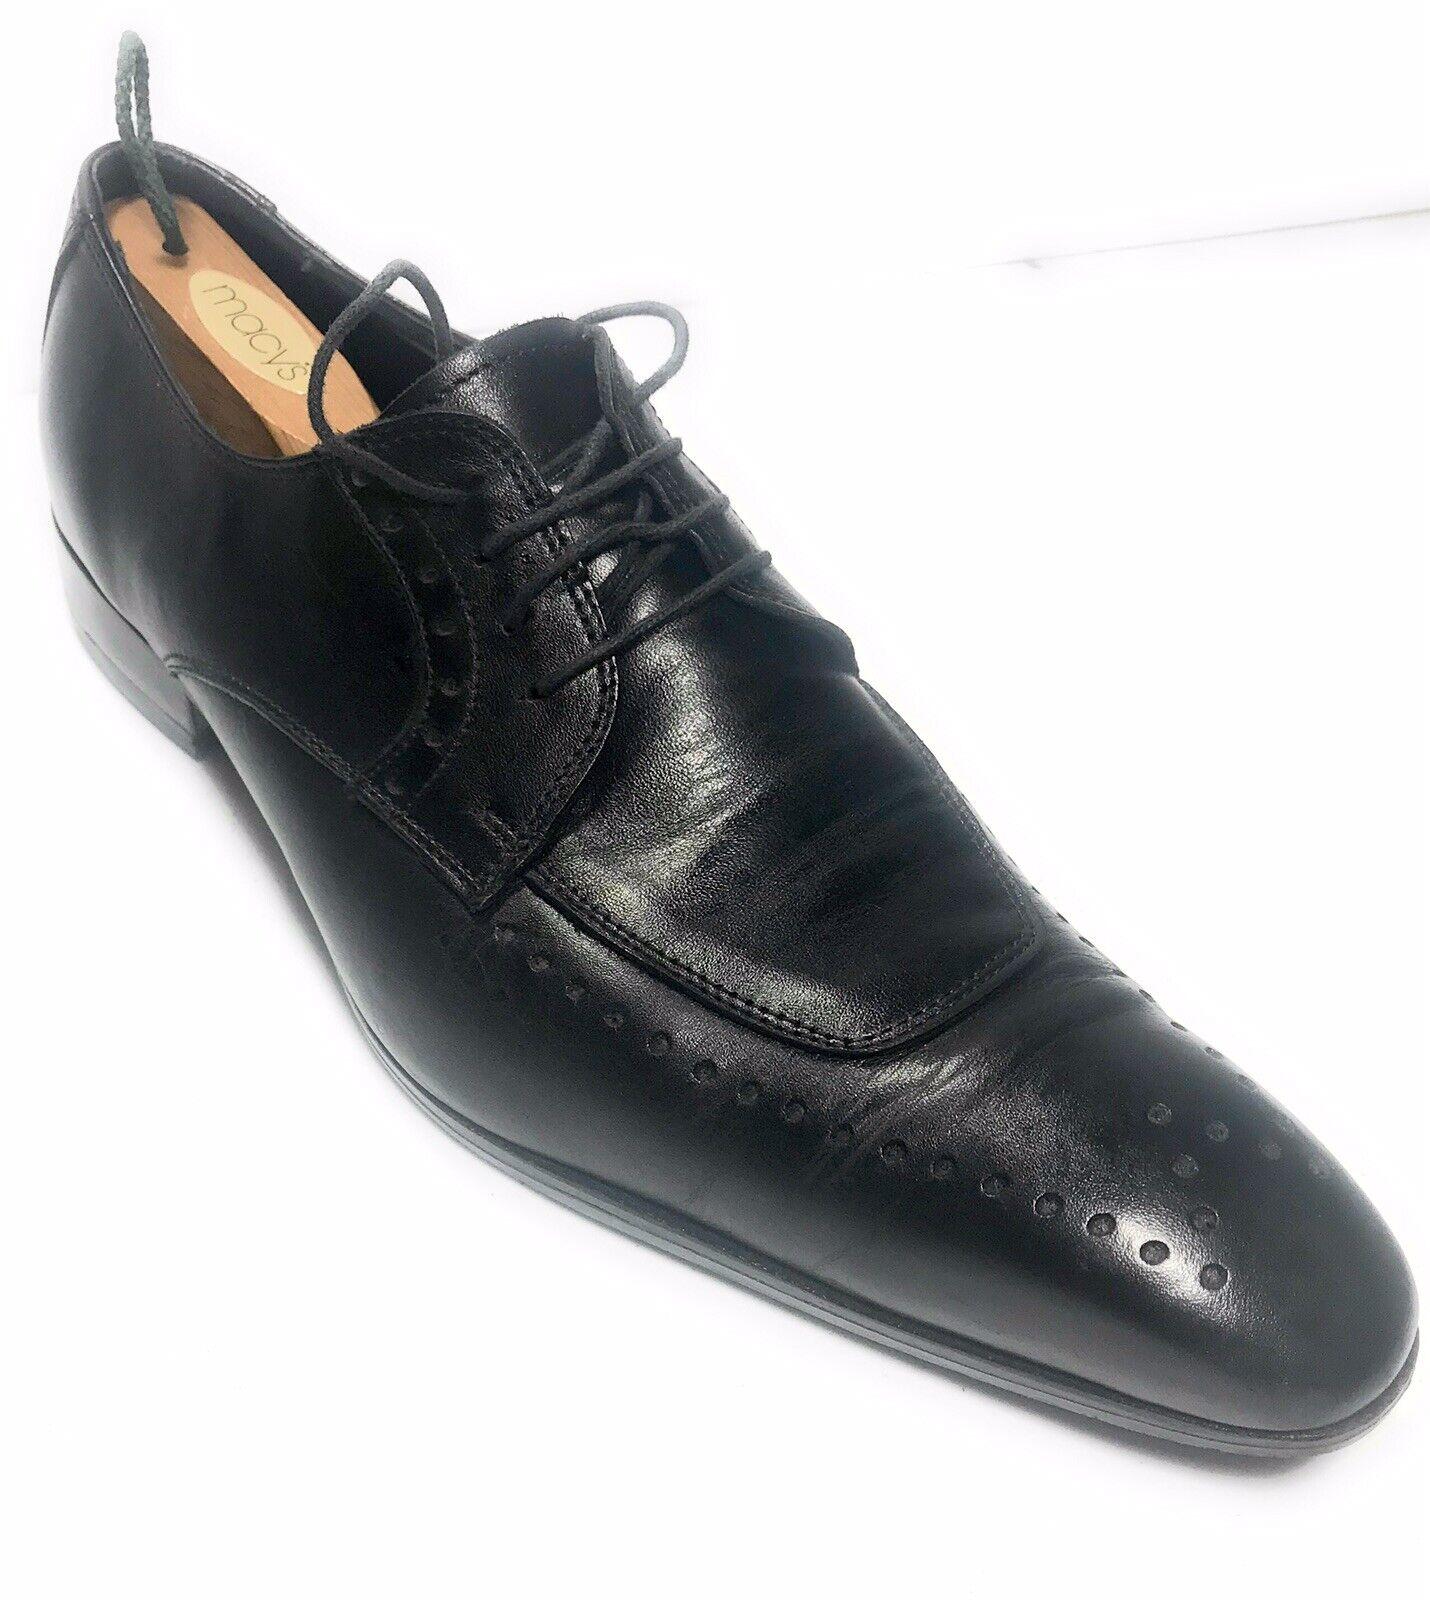 Finsbury homme noir en cuir Consul Oxford Chaussures Chaussure Sz 12